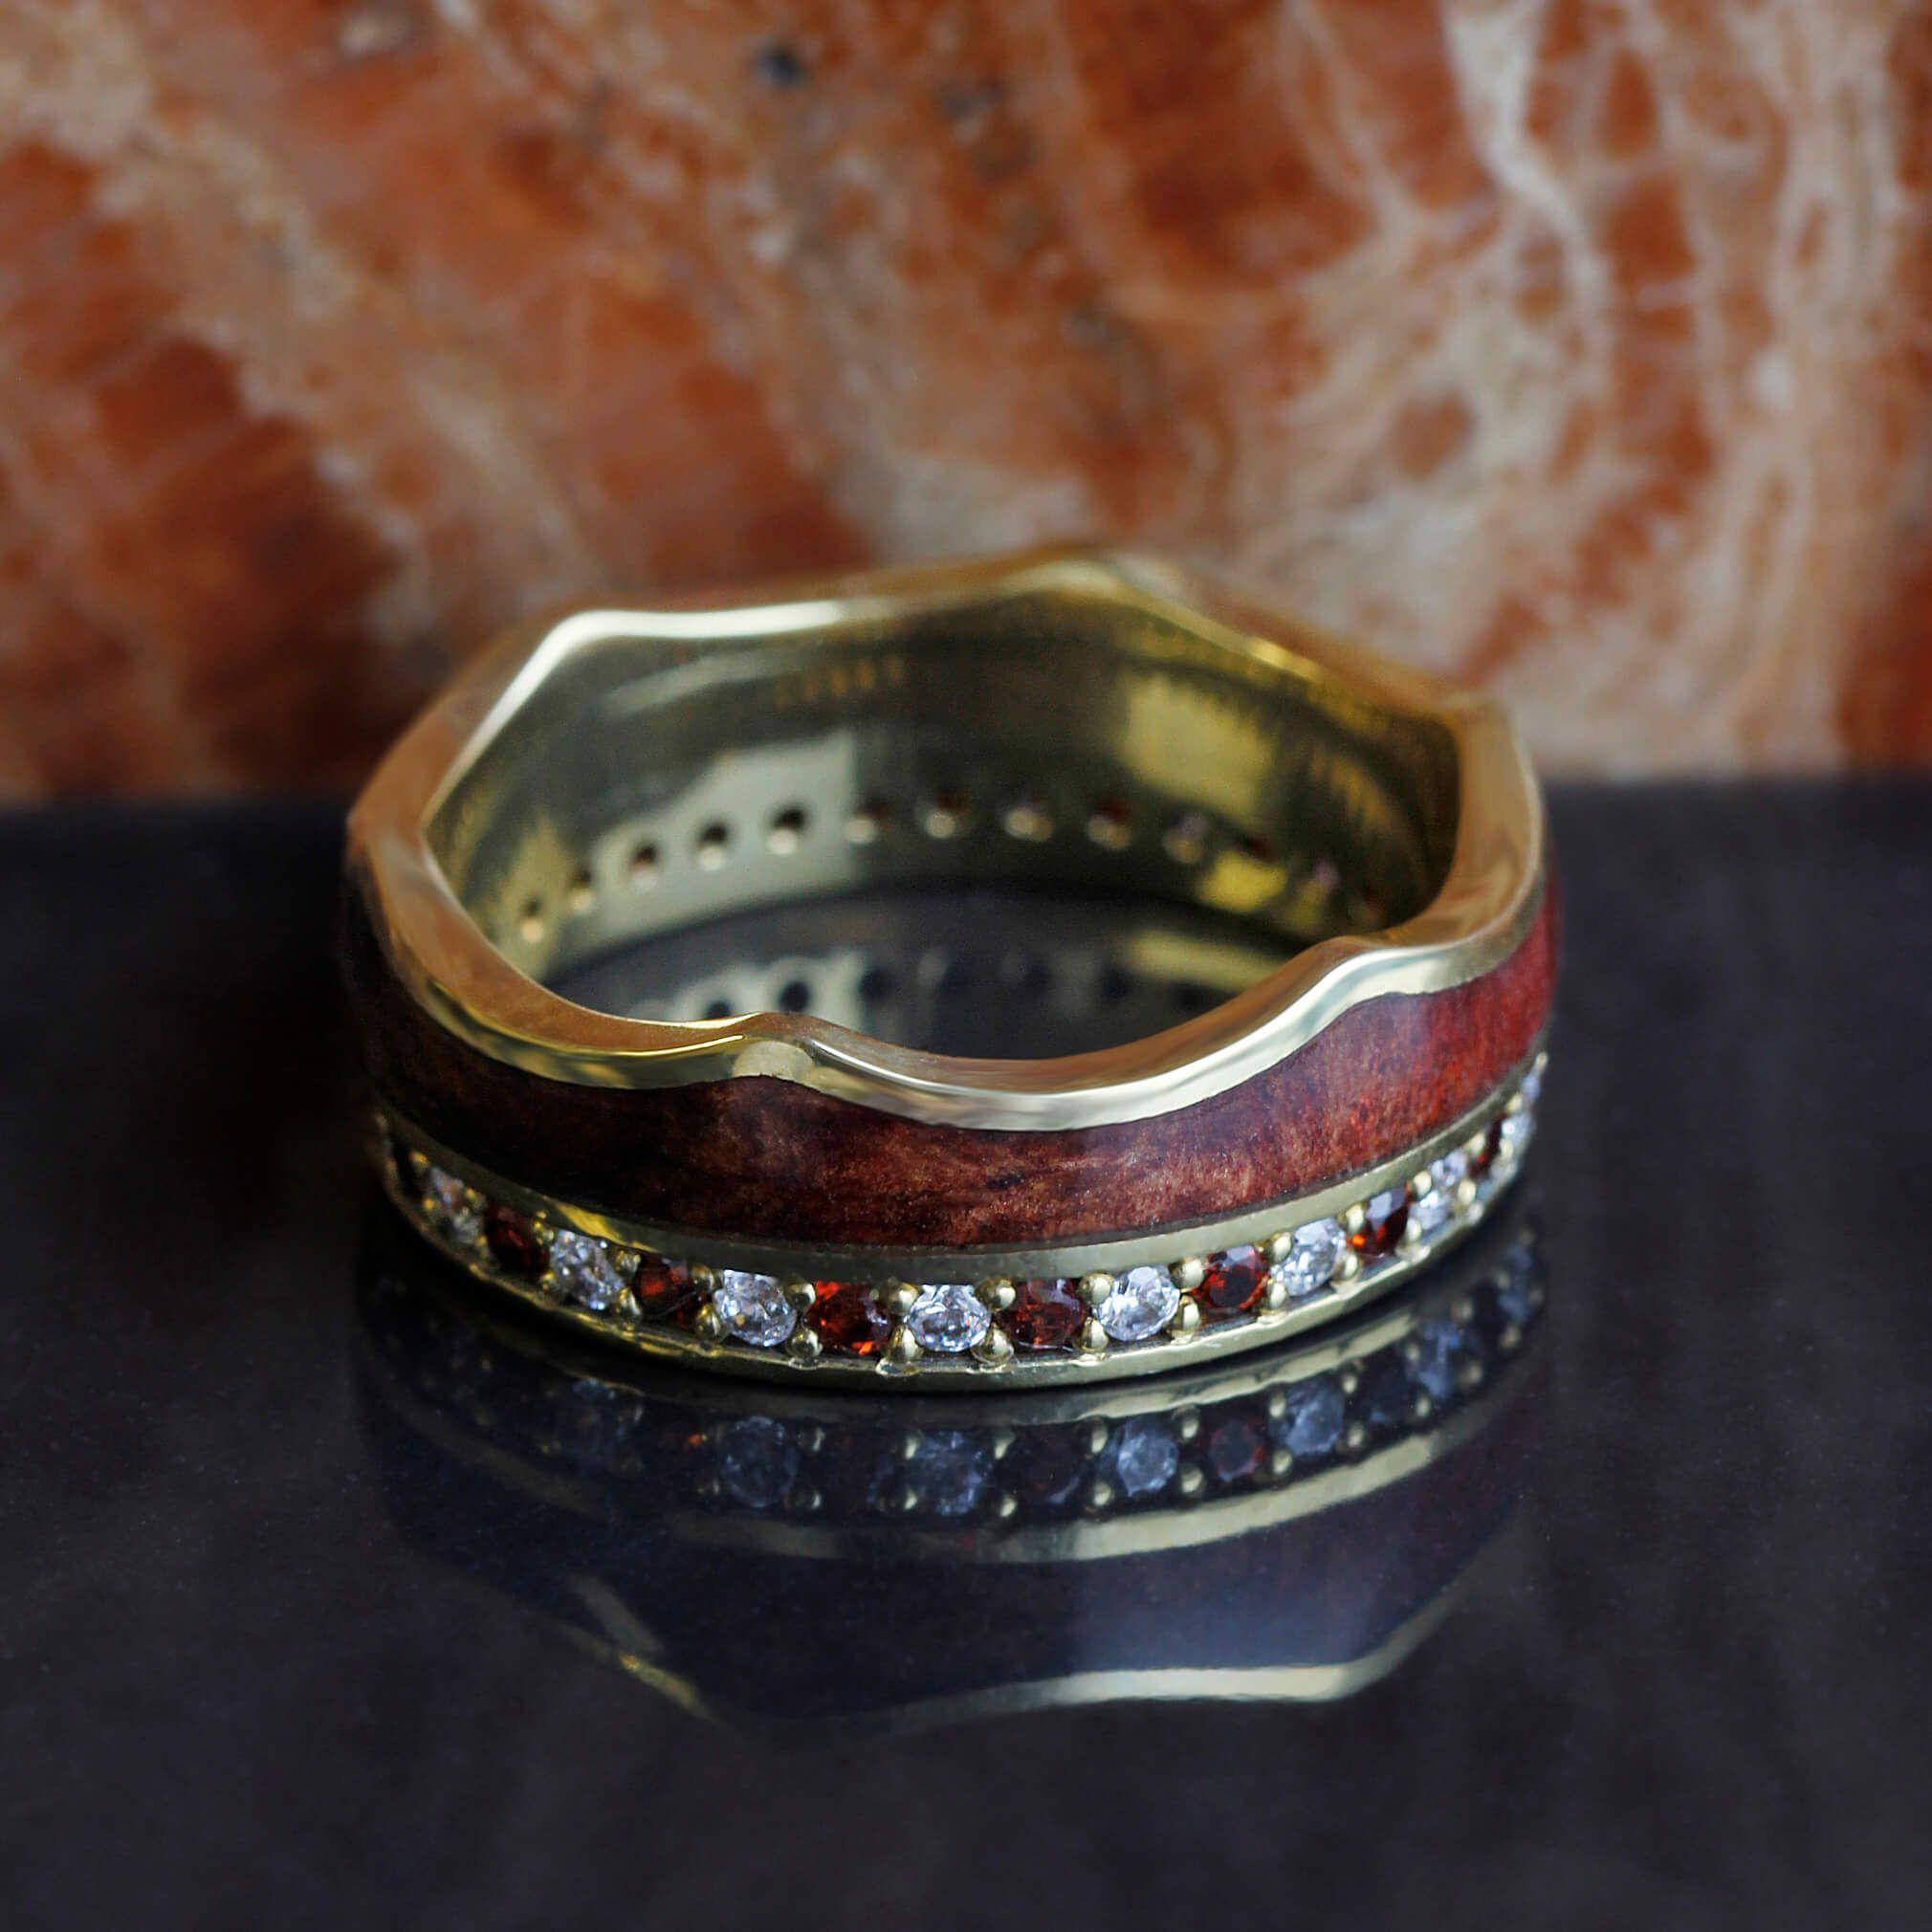 Crown Ring, Gemstone Eternity Wedding Band With Wood Inlay